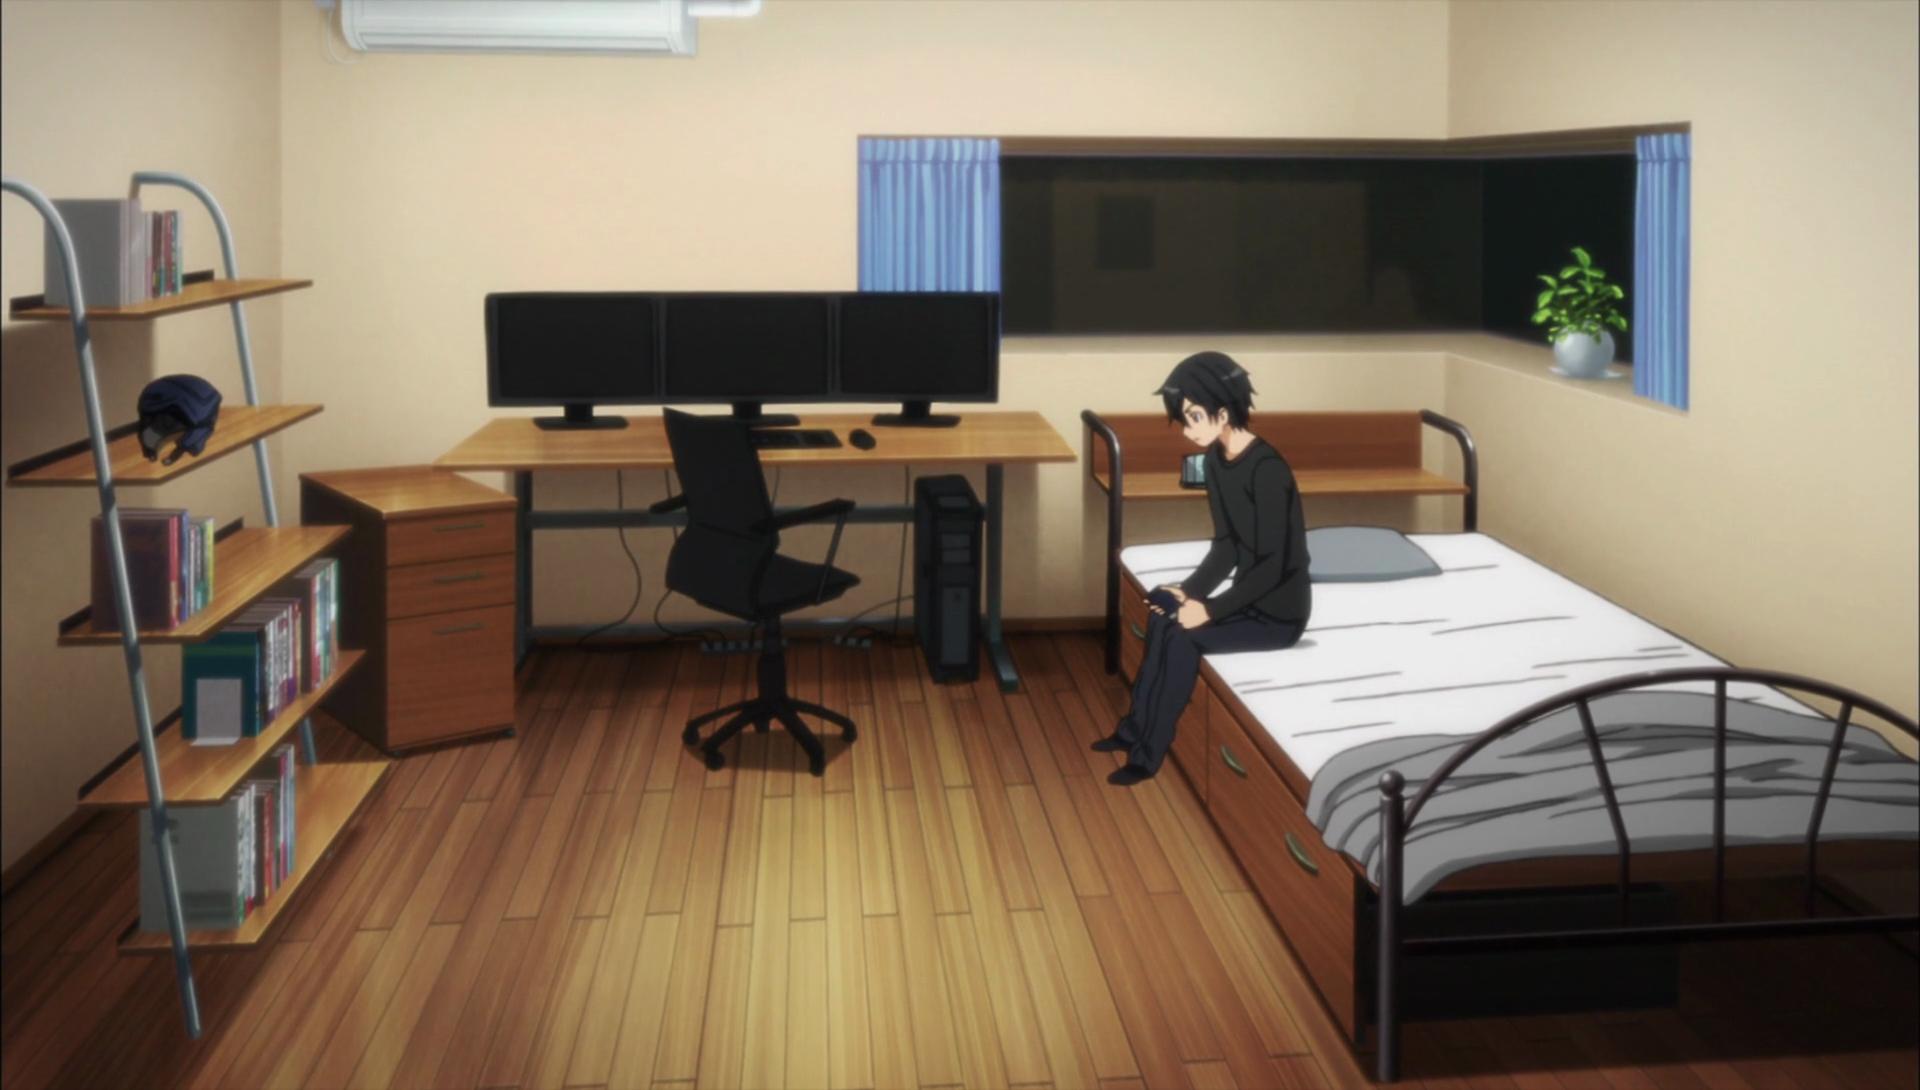 Twilight Bedroom Set Image Kirigaya Residence Kazuto S Room Png Sword Art